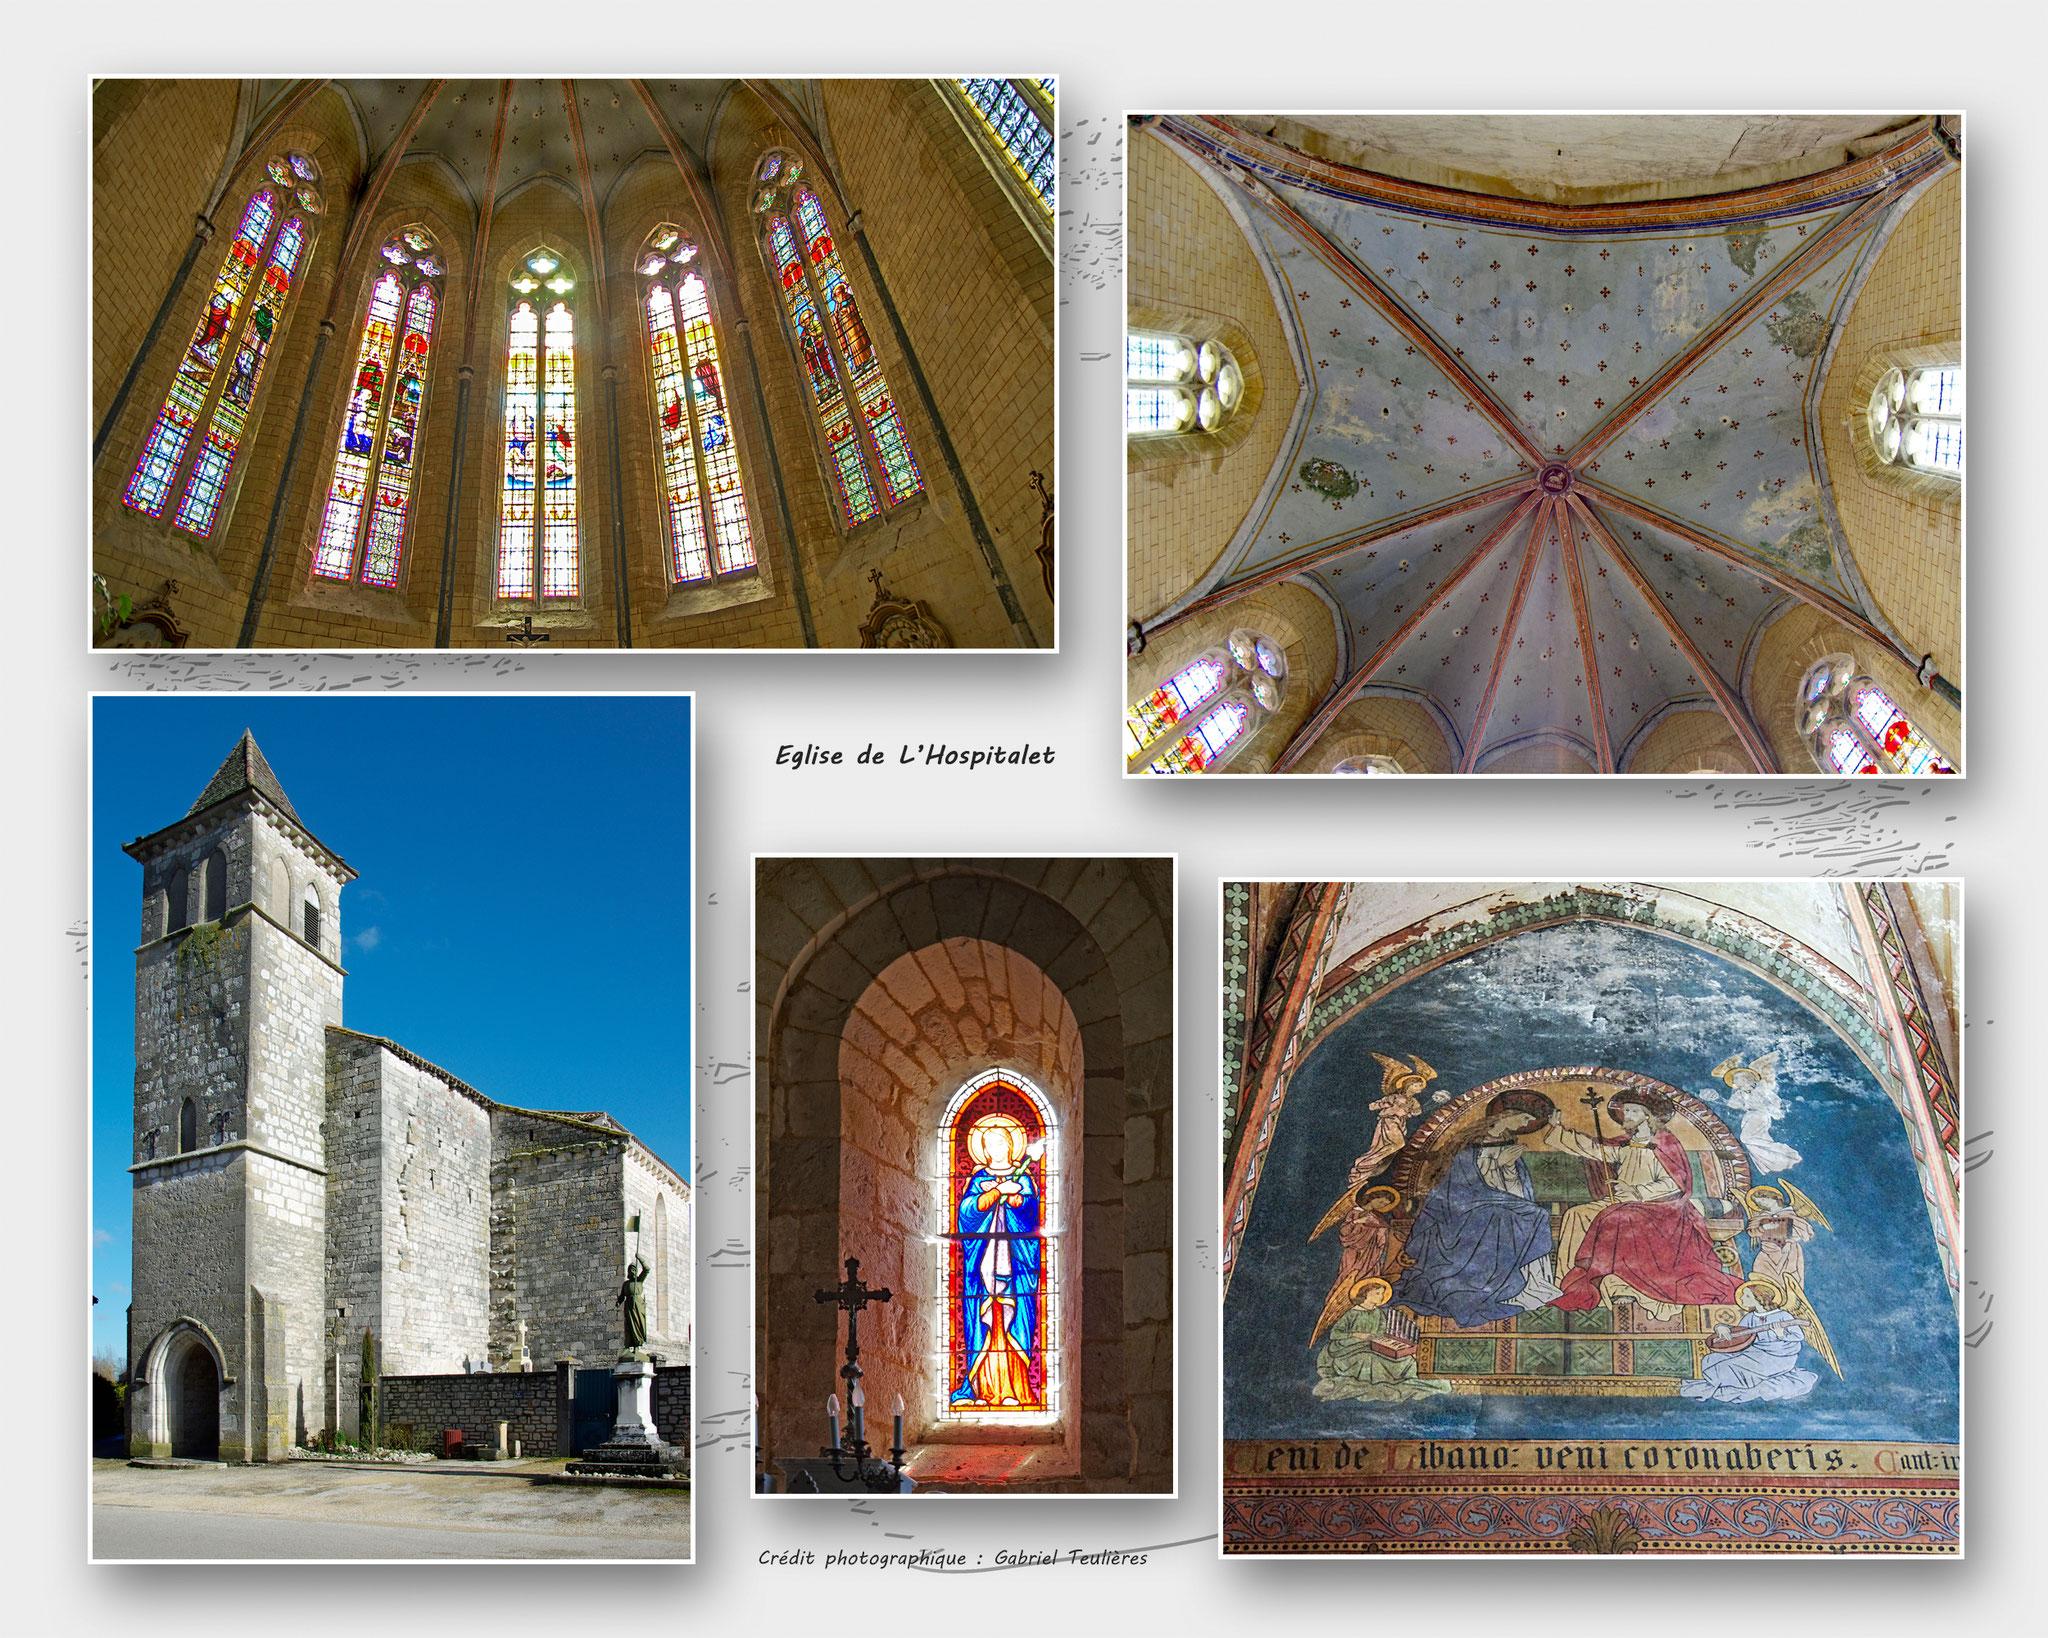 Eglise de L'Hospitalet